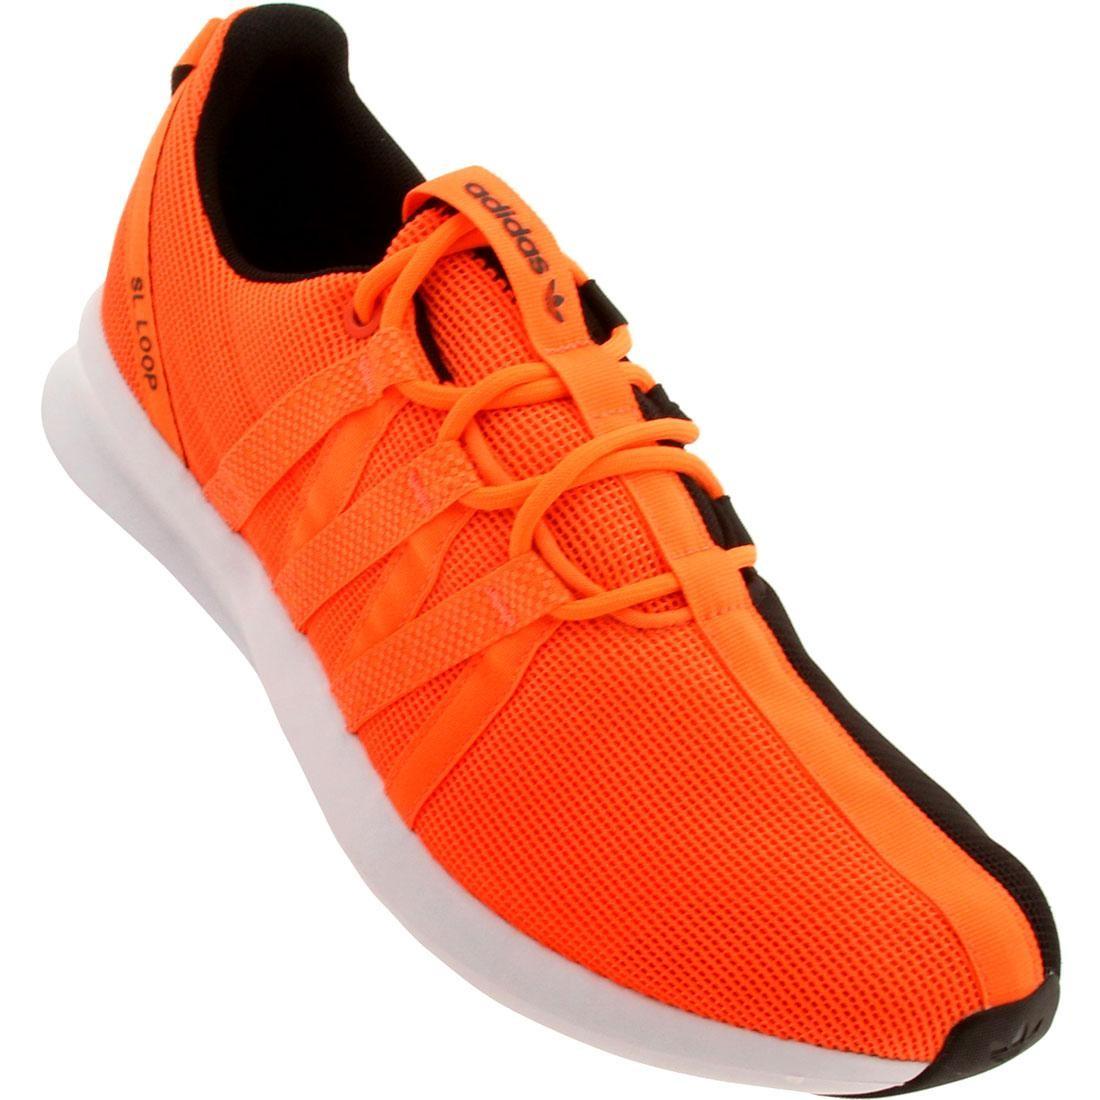 adidas Creates a Spin Off SL Loop Sneaker   Sole Collector